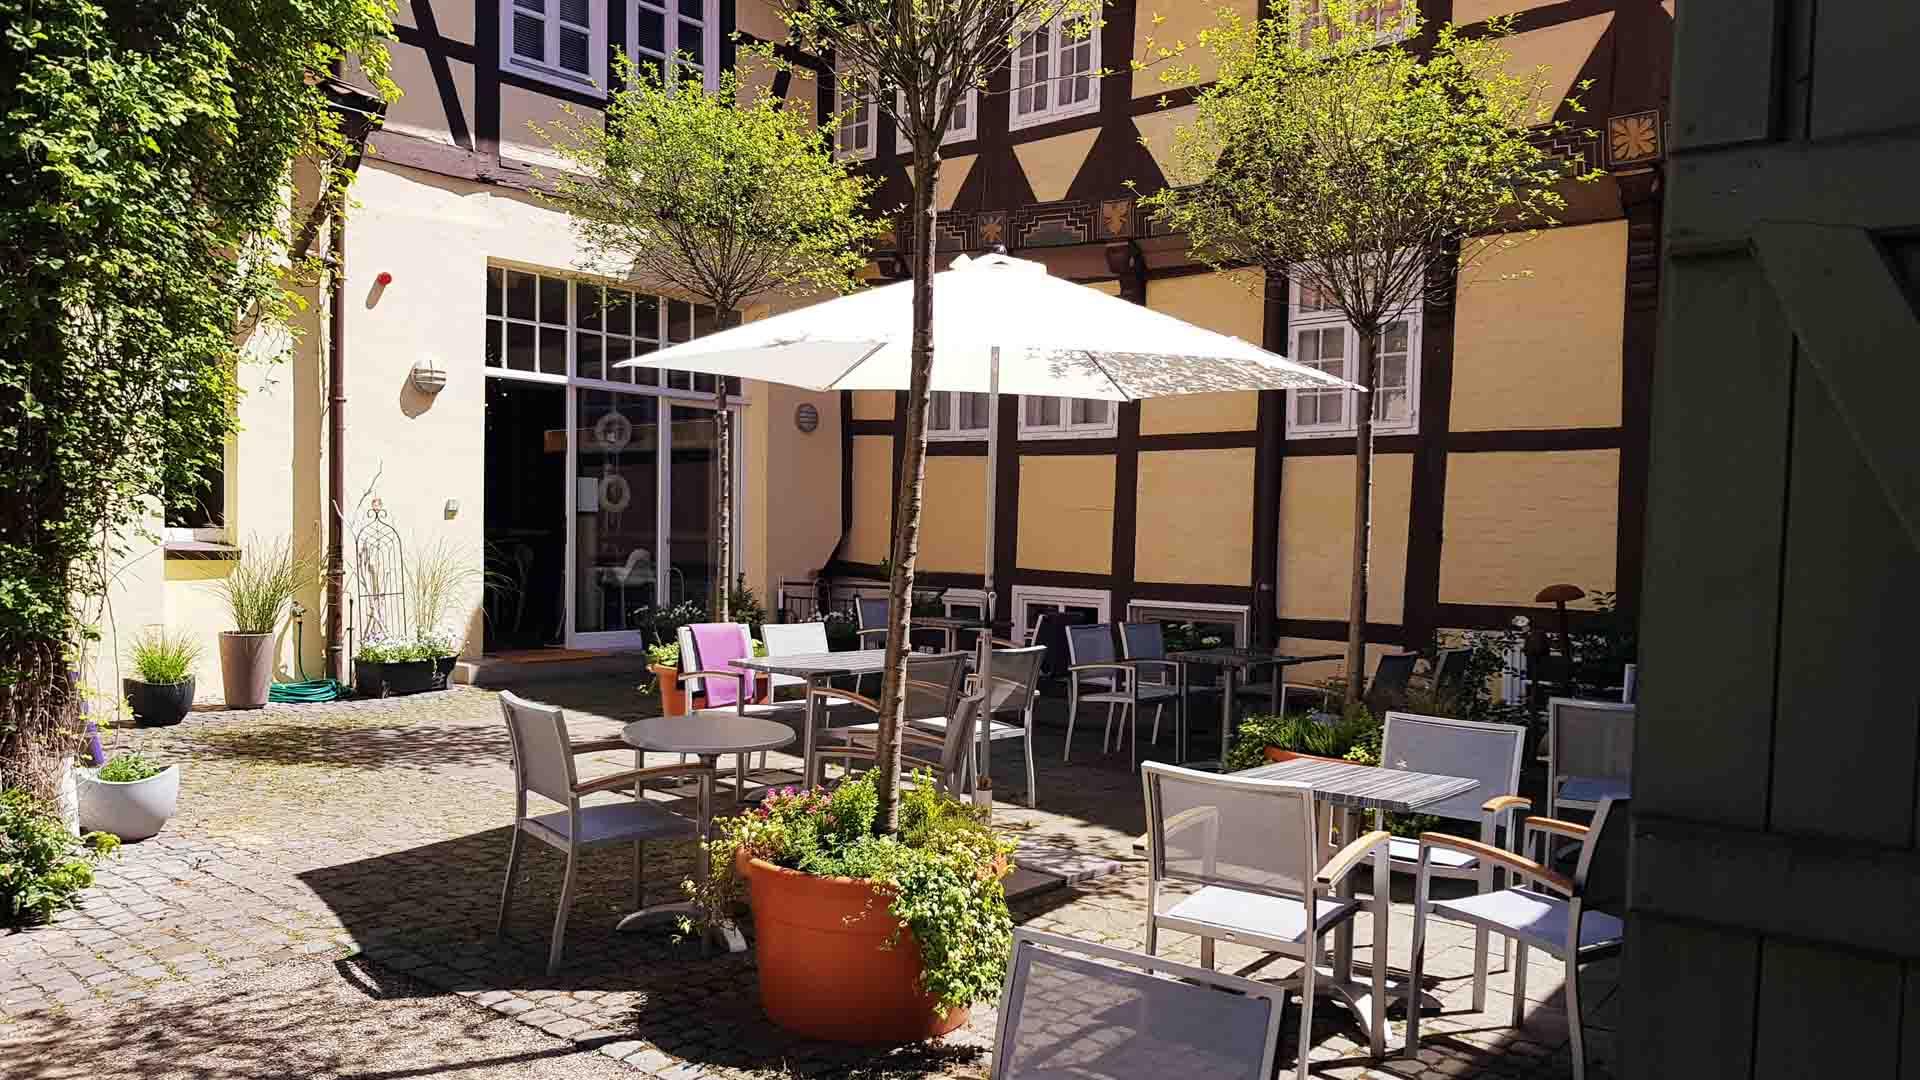 Café Baxmann Celle, Innenhof